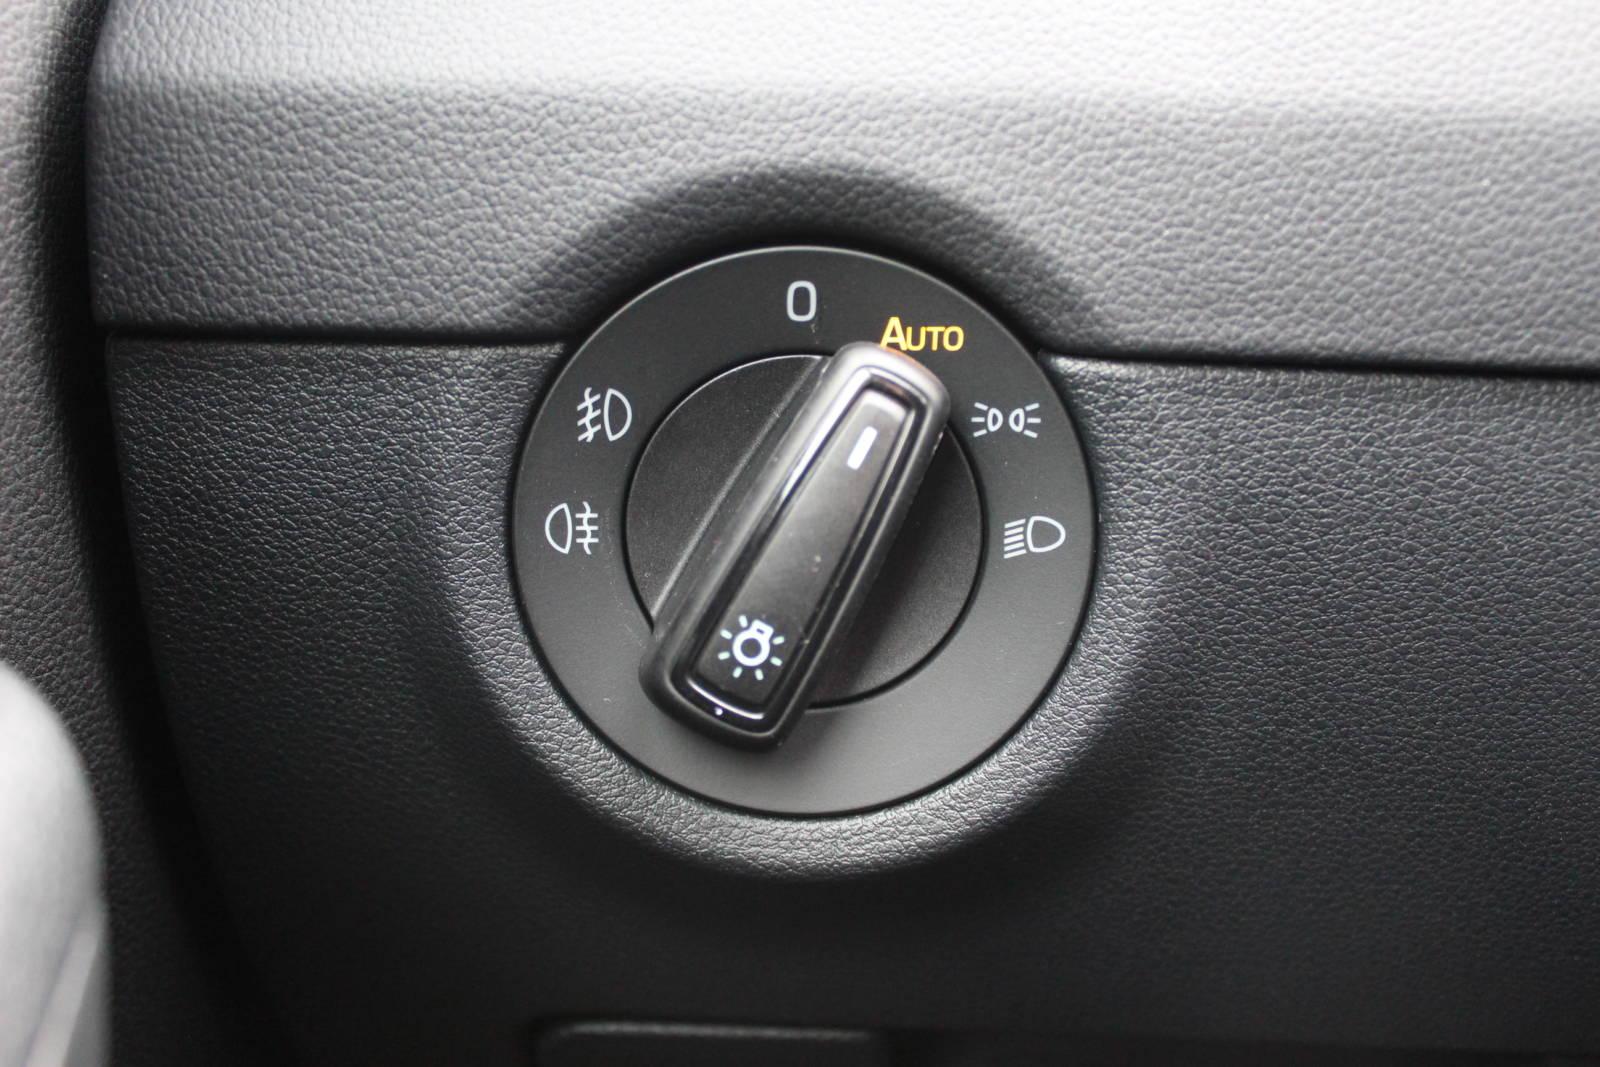 Skoda Octavia Kombi RS TDI DSG 4x4 2.0 / Deutsche Neufahrzeuge und EU-Neufahrzeuge – Aha! Fahrzeughandel GmbH in Althengstett